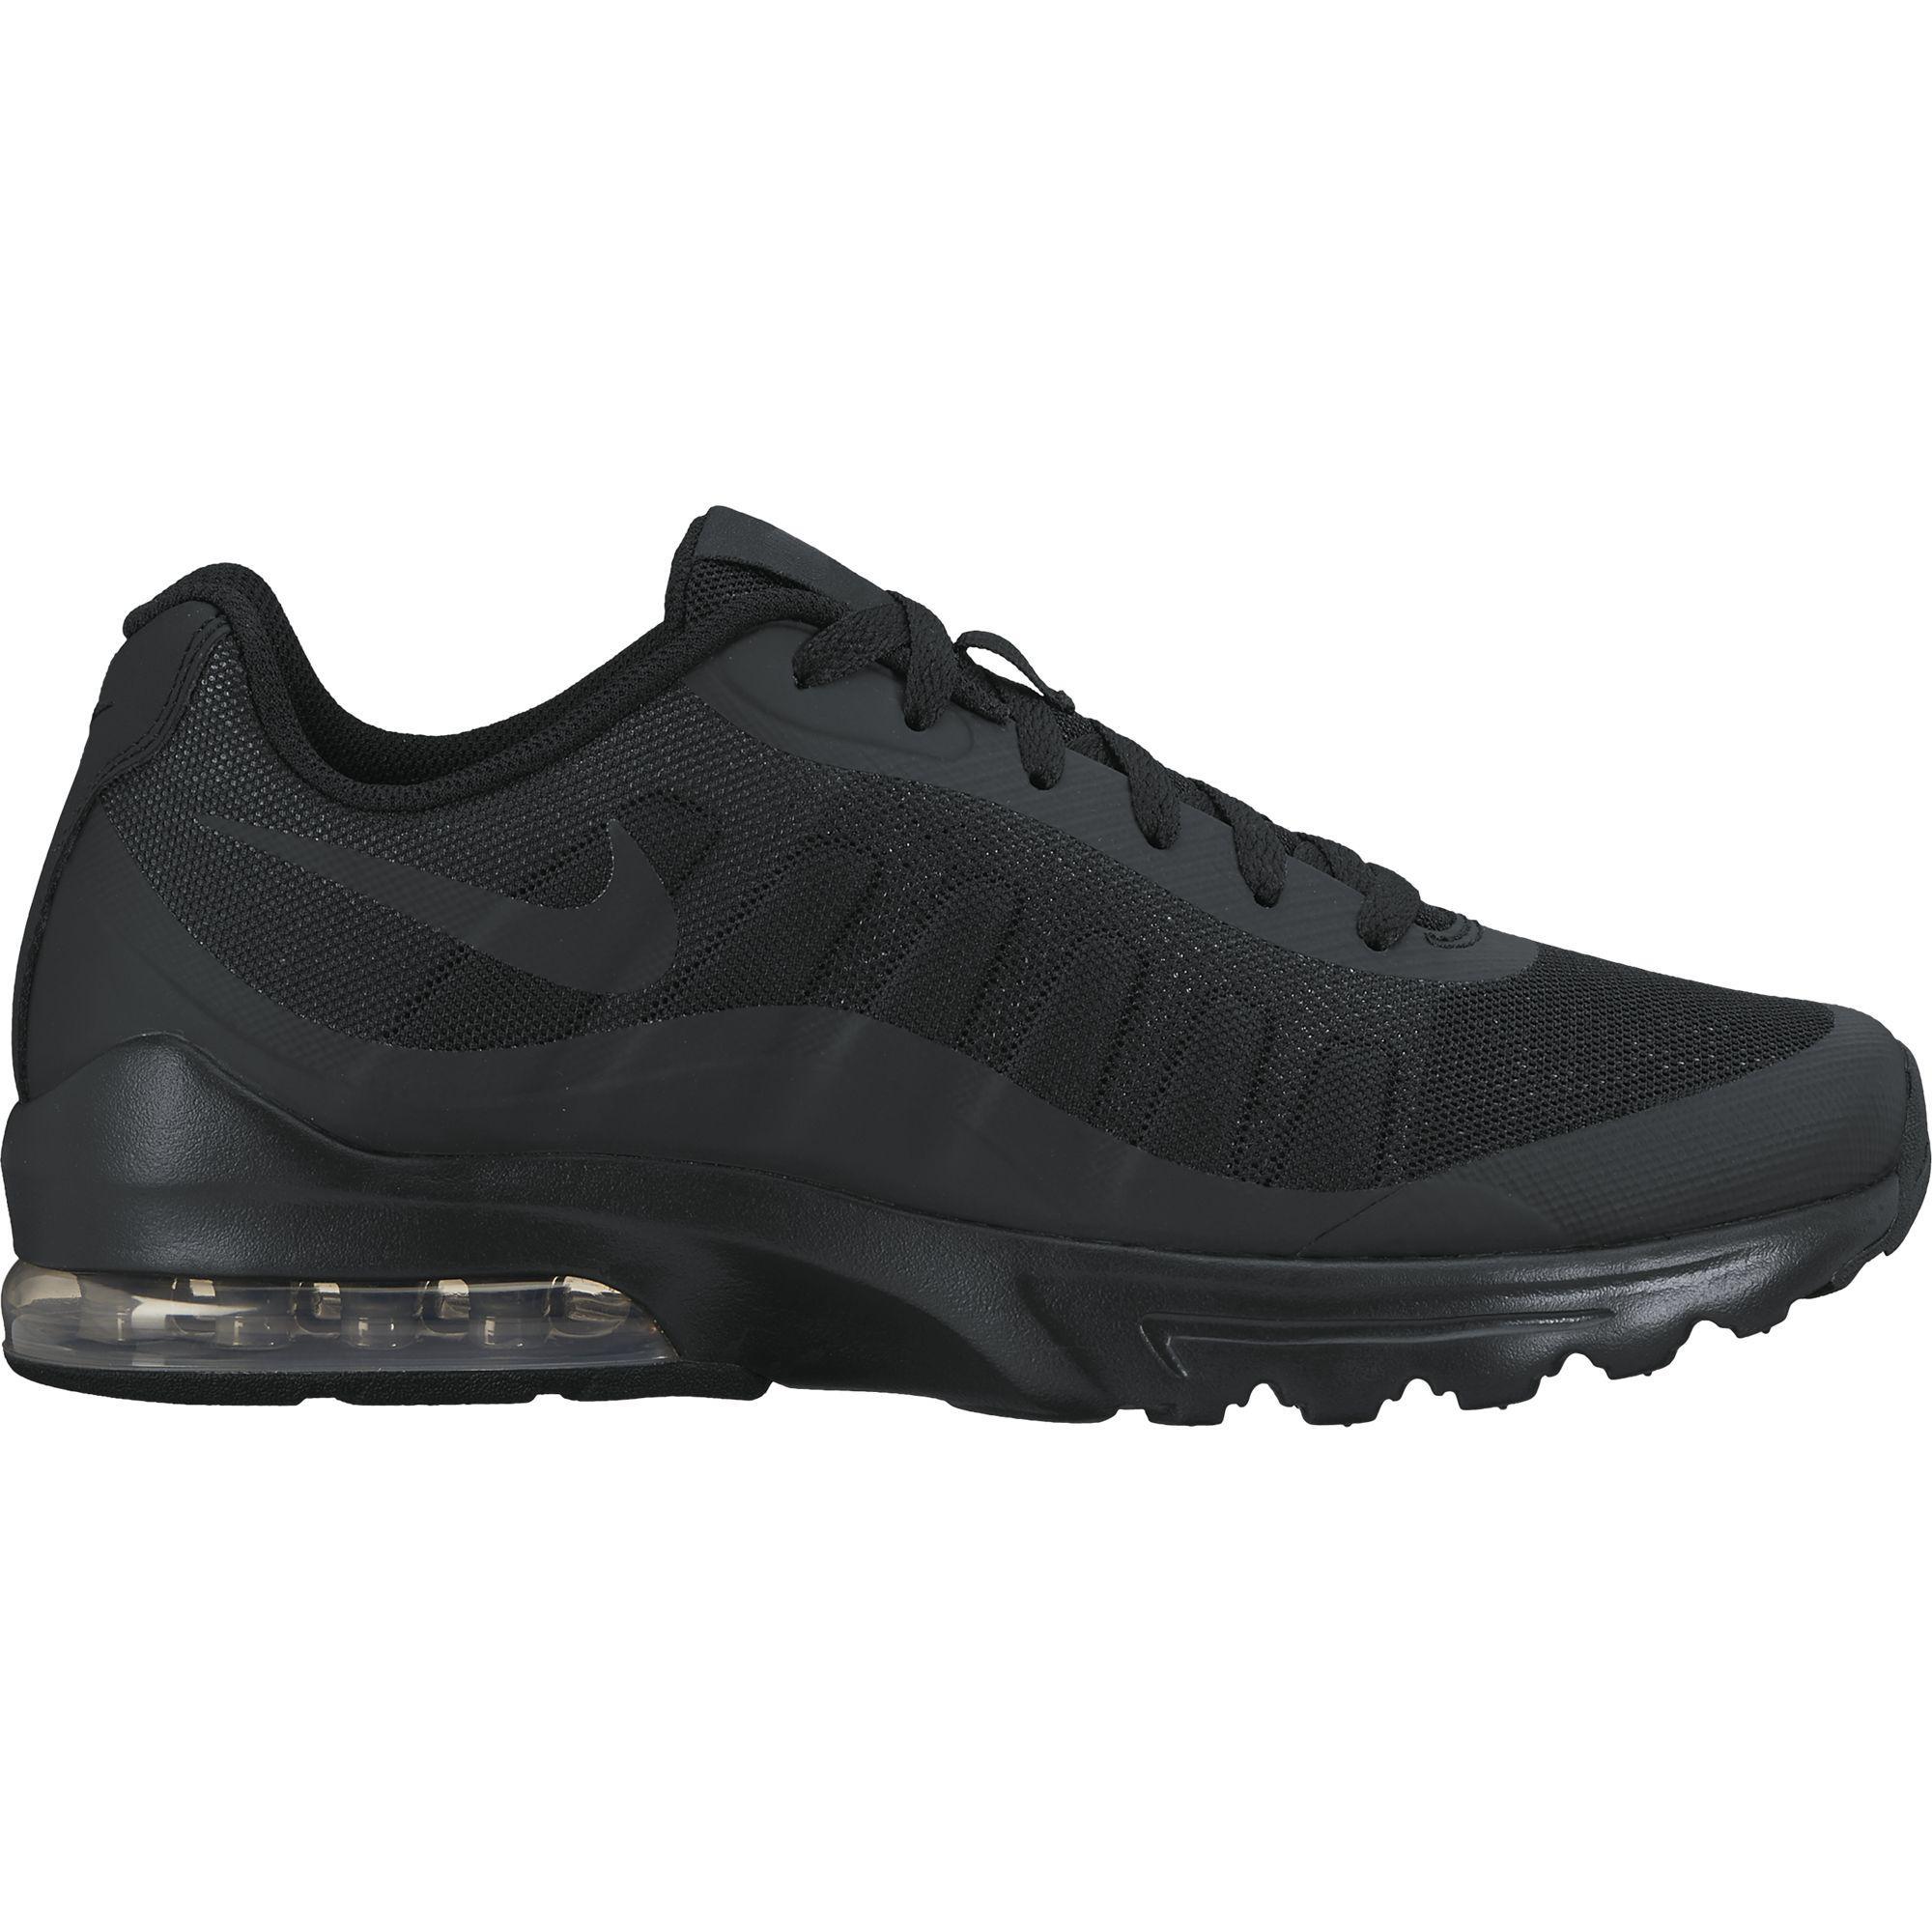 a few days away wholesale usa cheap sale Nike Mens Air Max Invigor Running Shoes - Black